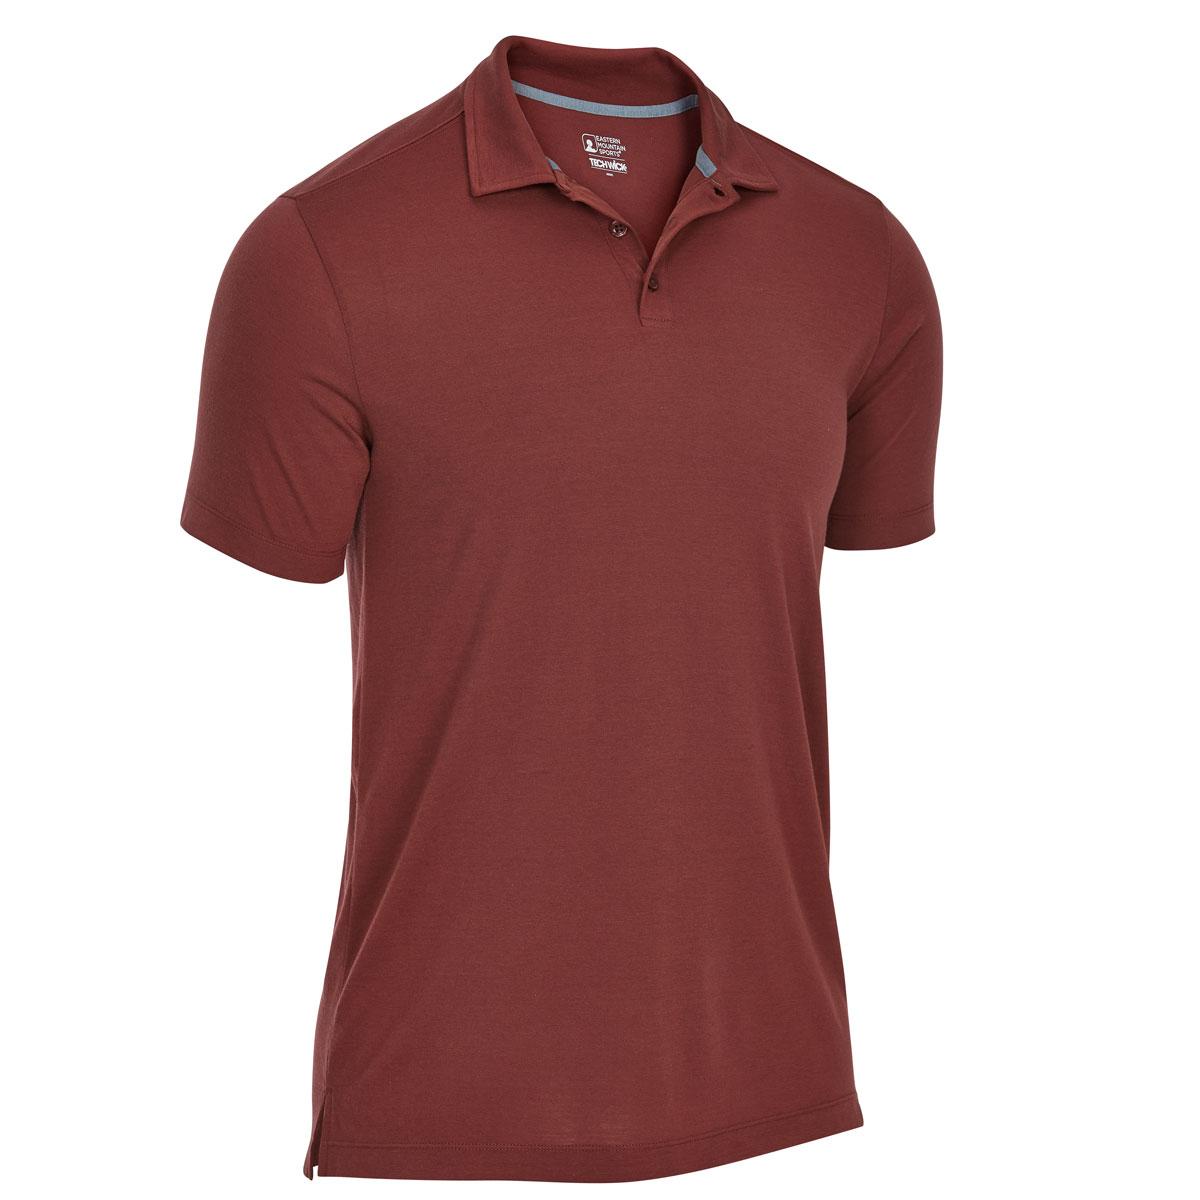 Ems Men's Techwick Vital Polo - Red, M